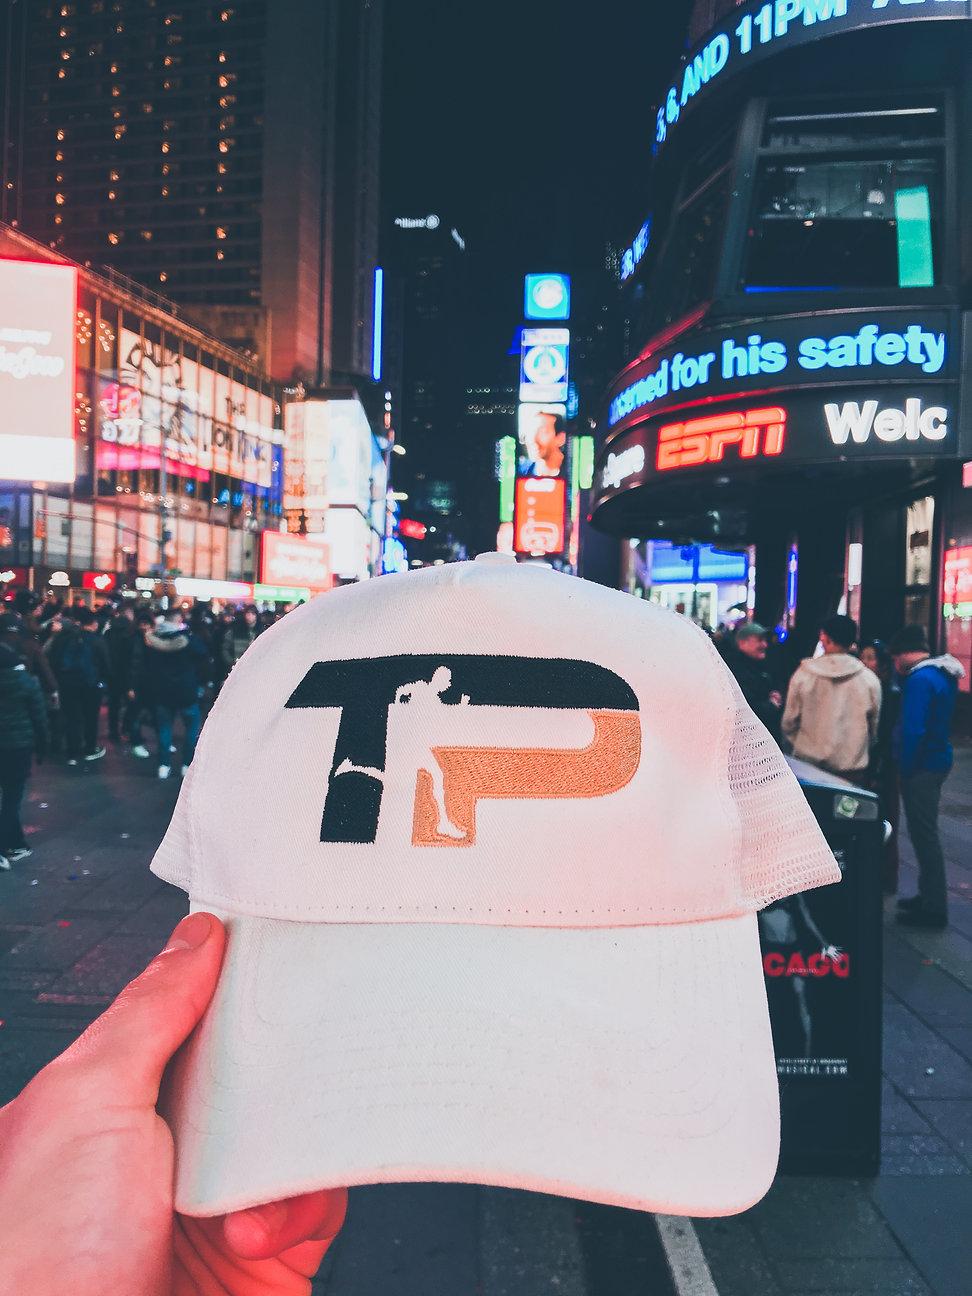 TP HAT PIC - TIMES SQUARE.JPEG